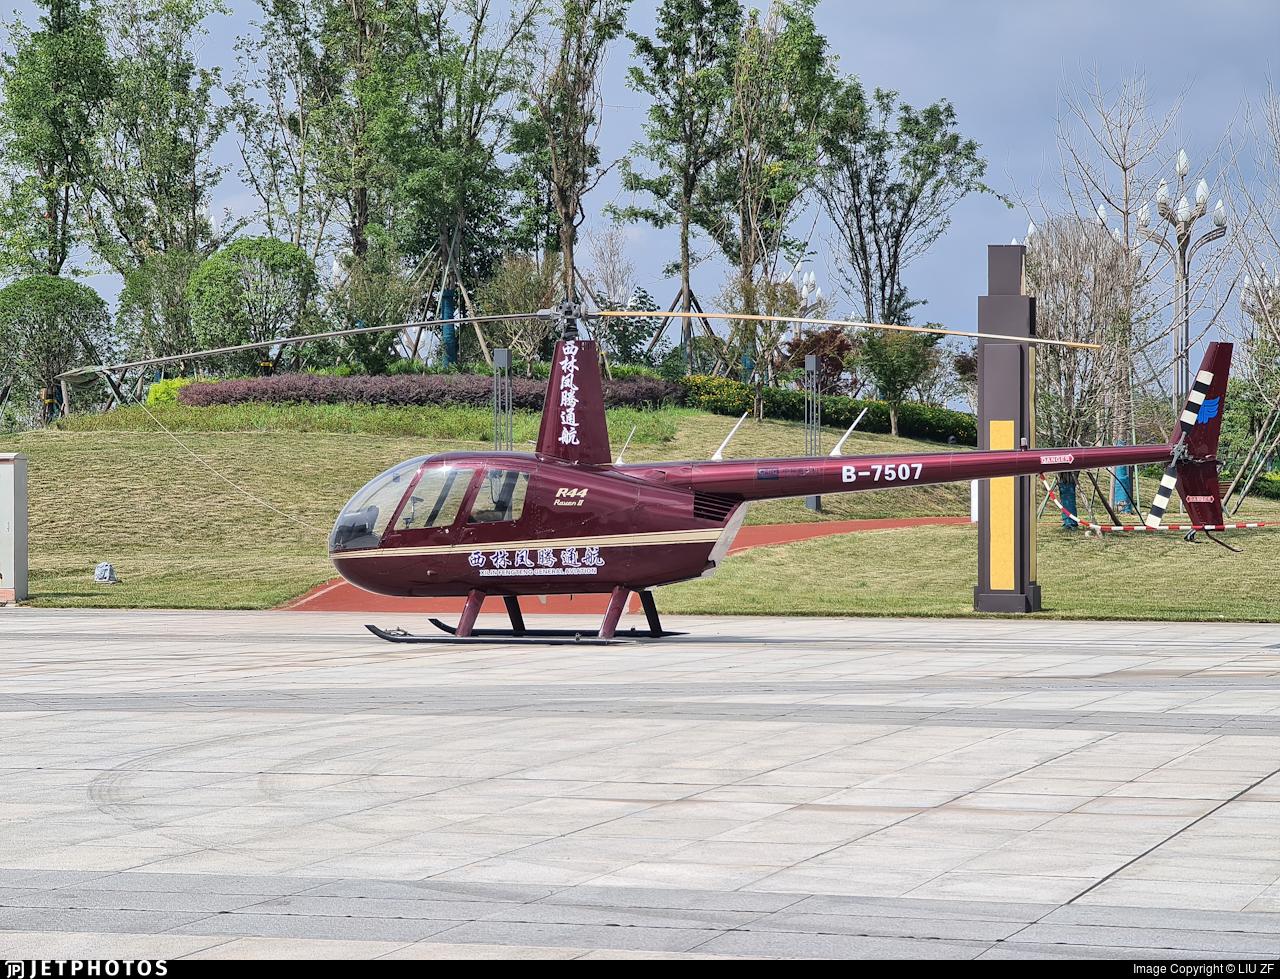 B-7507 - Robinson R44 Raven II - Sichuan Xiling Fengteng General Aviation